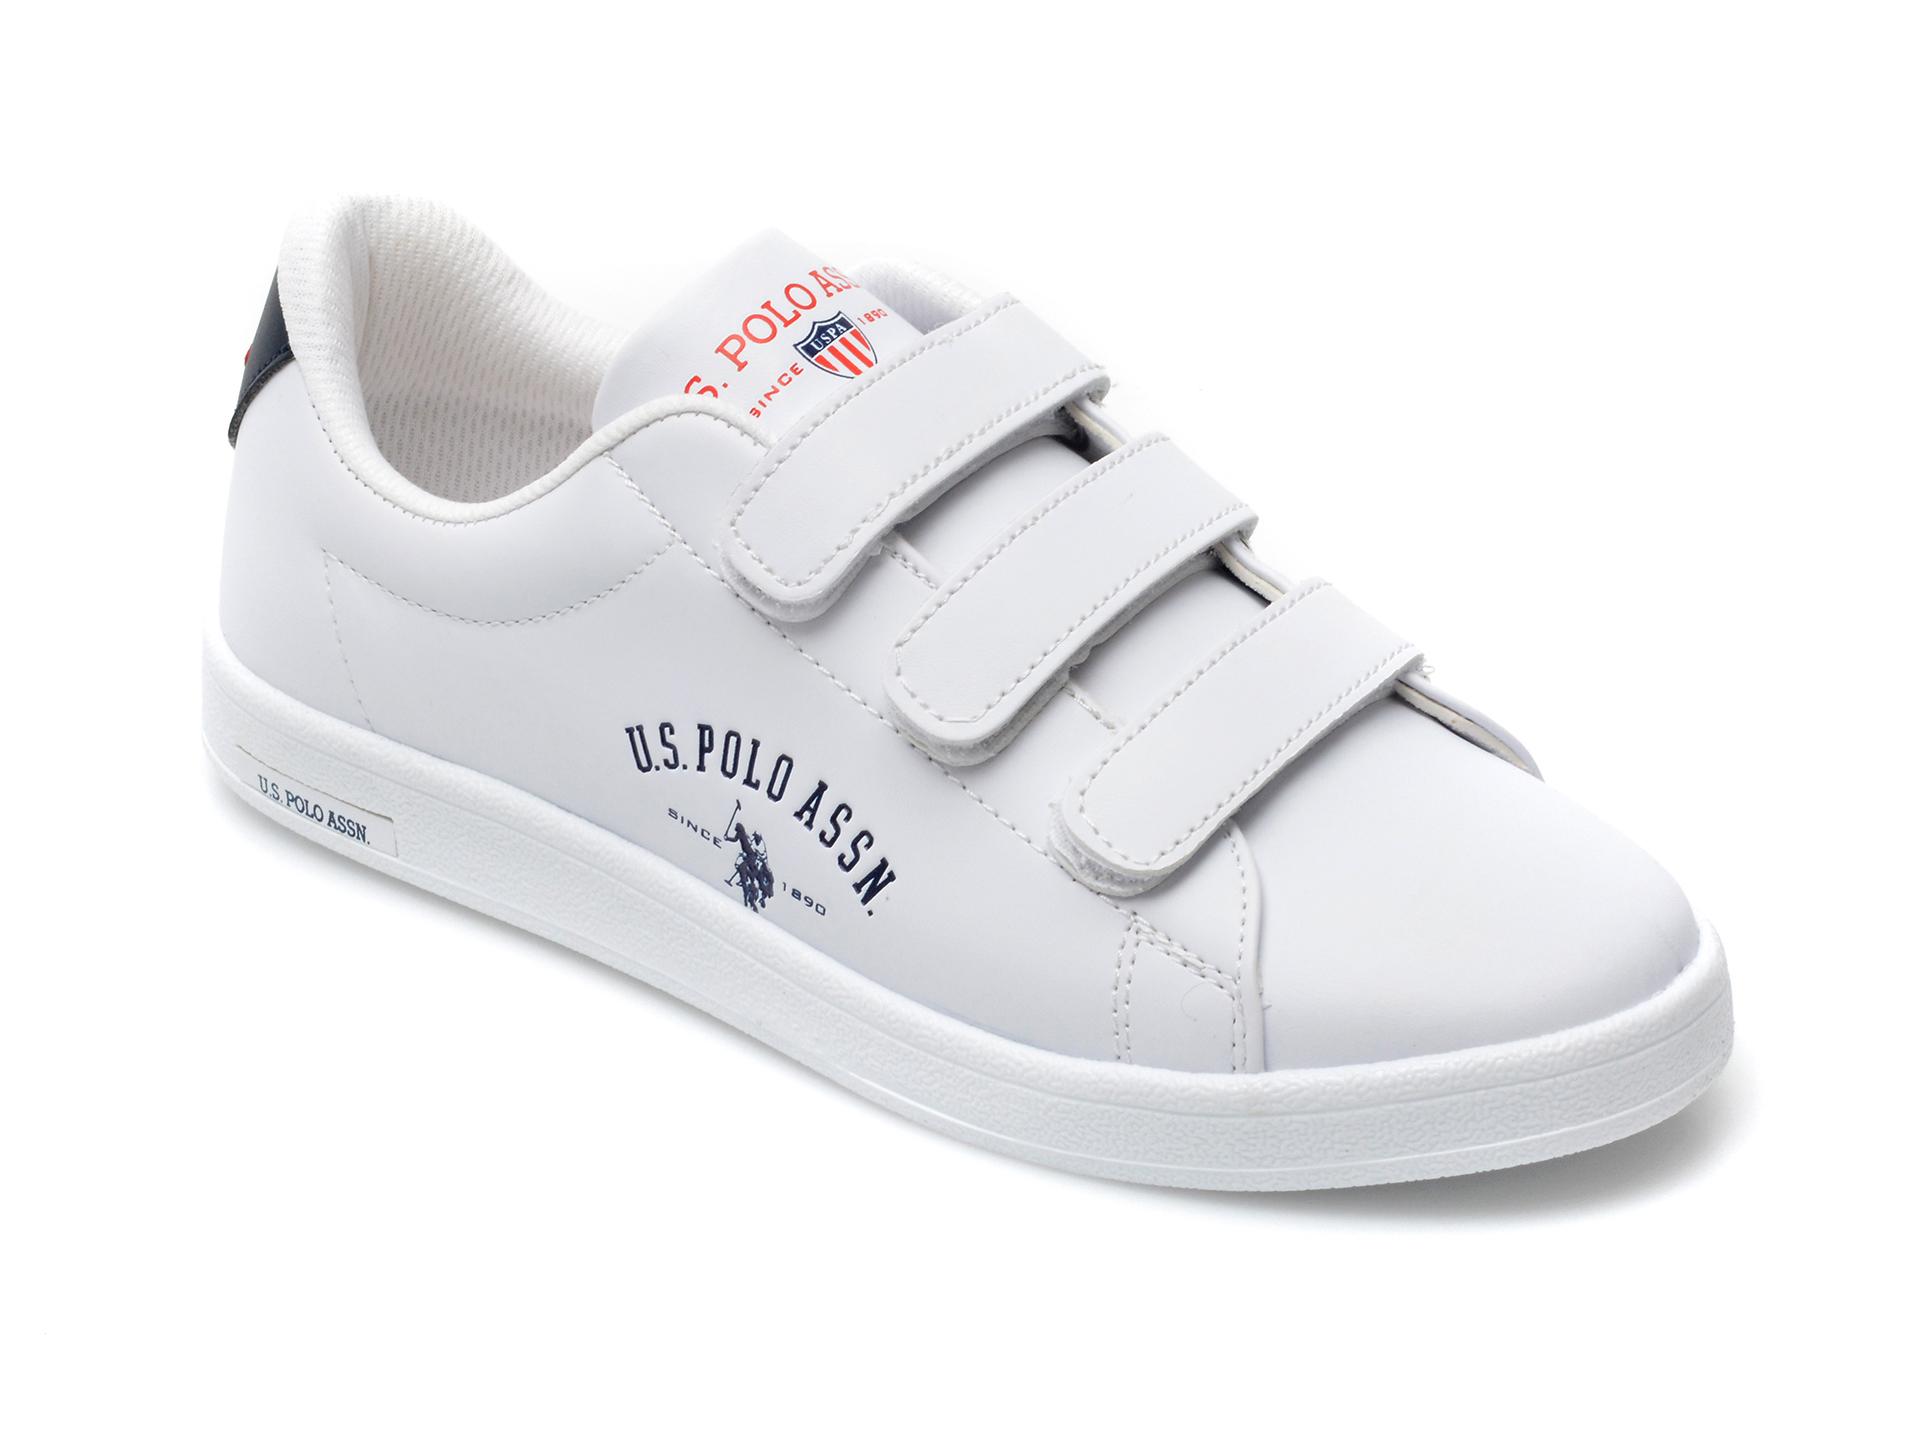 Pantofi sport US POLO ASSN albi, SINWM1F, din piele ecologica imagine otter.ro 2021